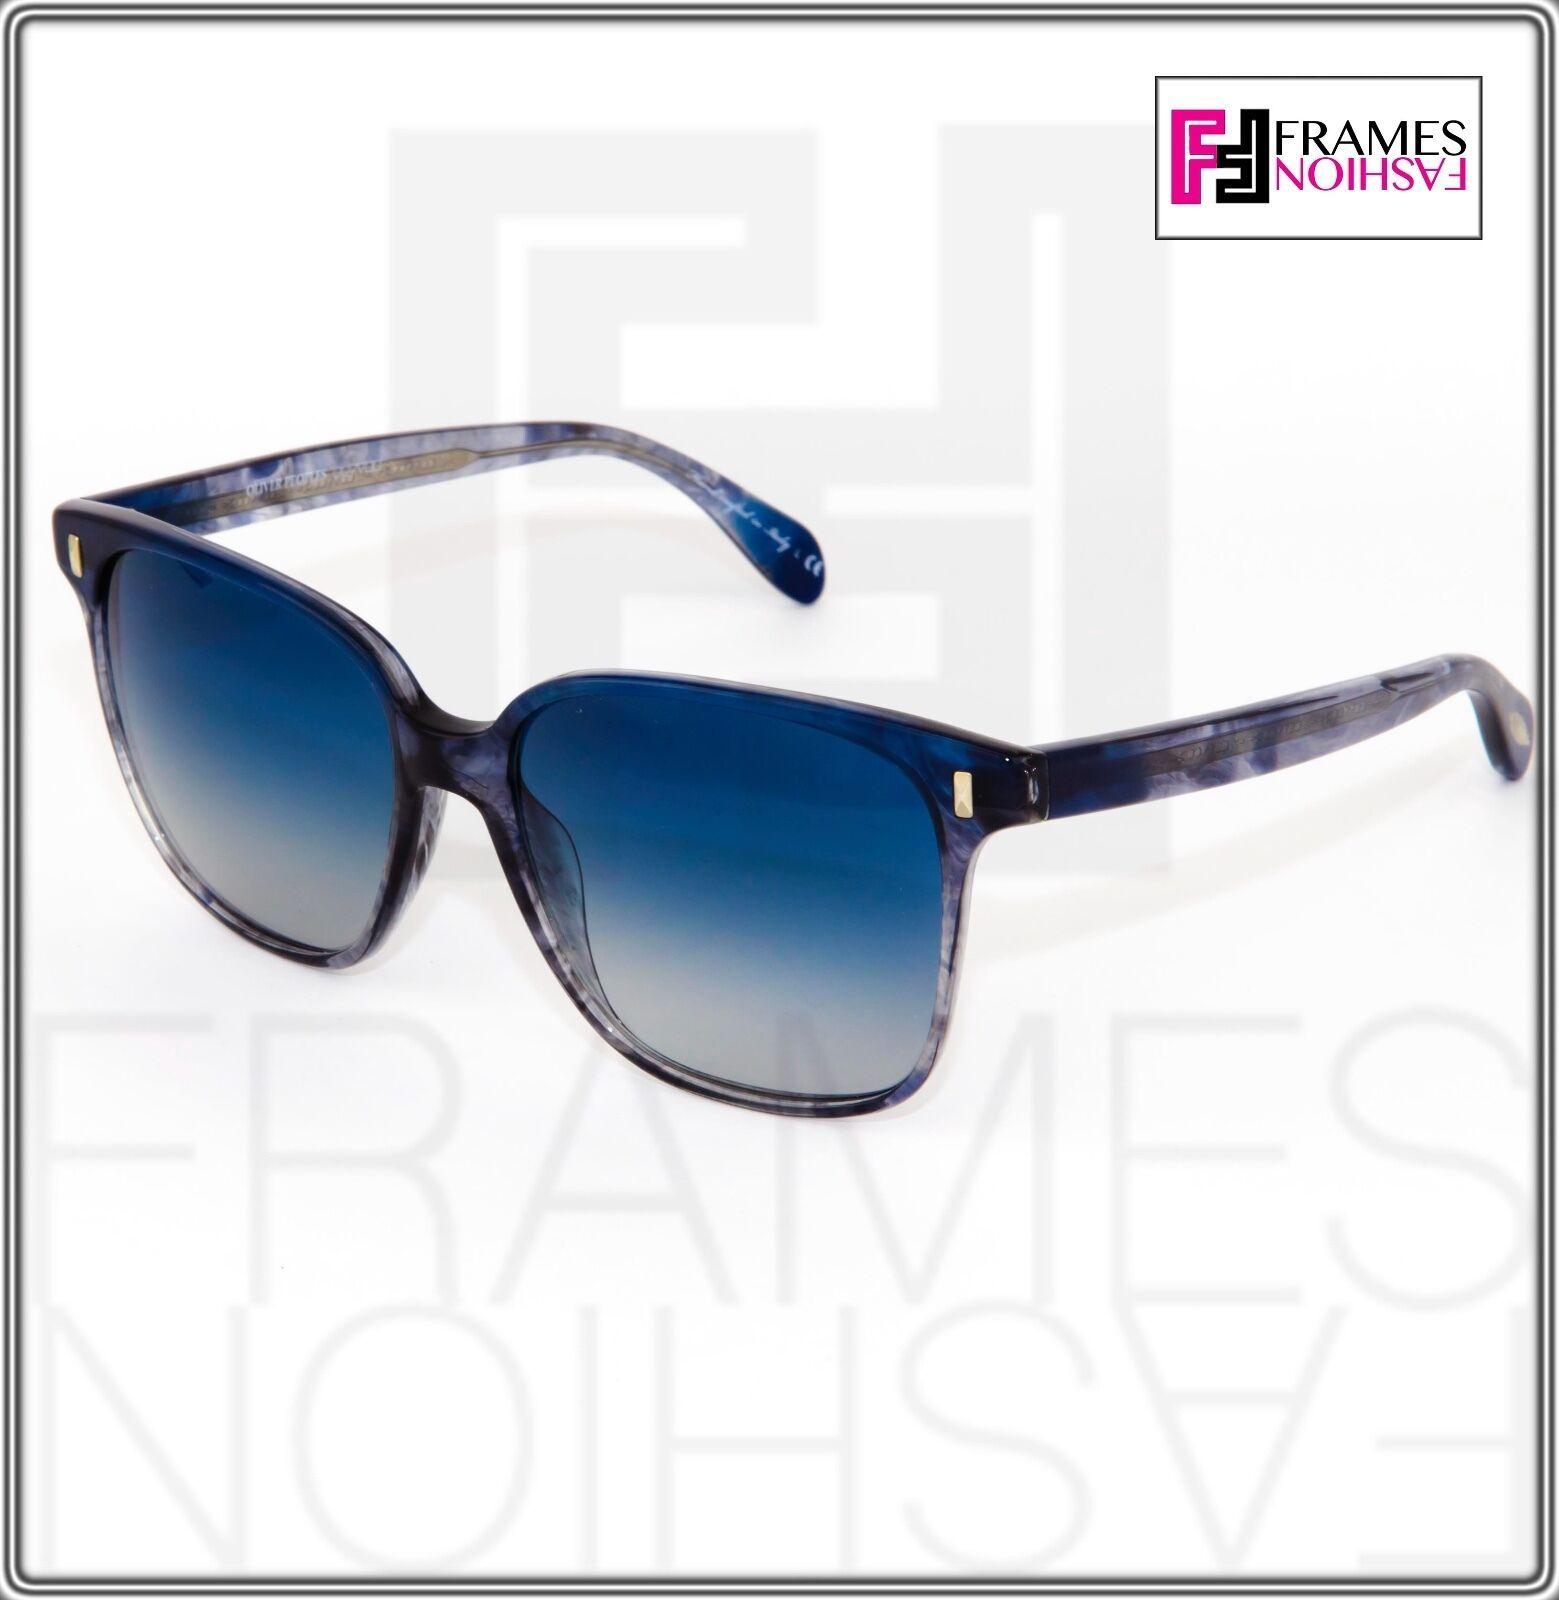 OLIVER PEOPLES MARMOT Square OV5266S Faded Sea Pacific Blue Sunglasses 5266 image 9